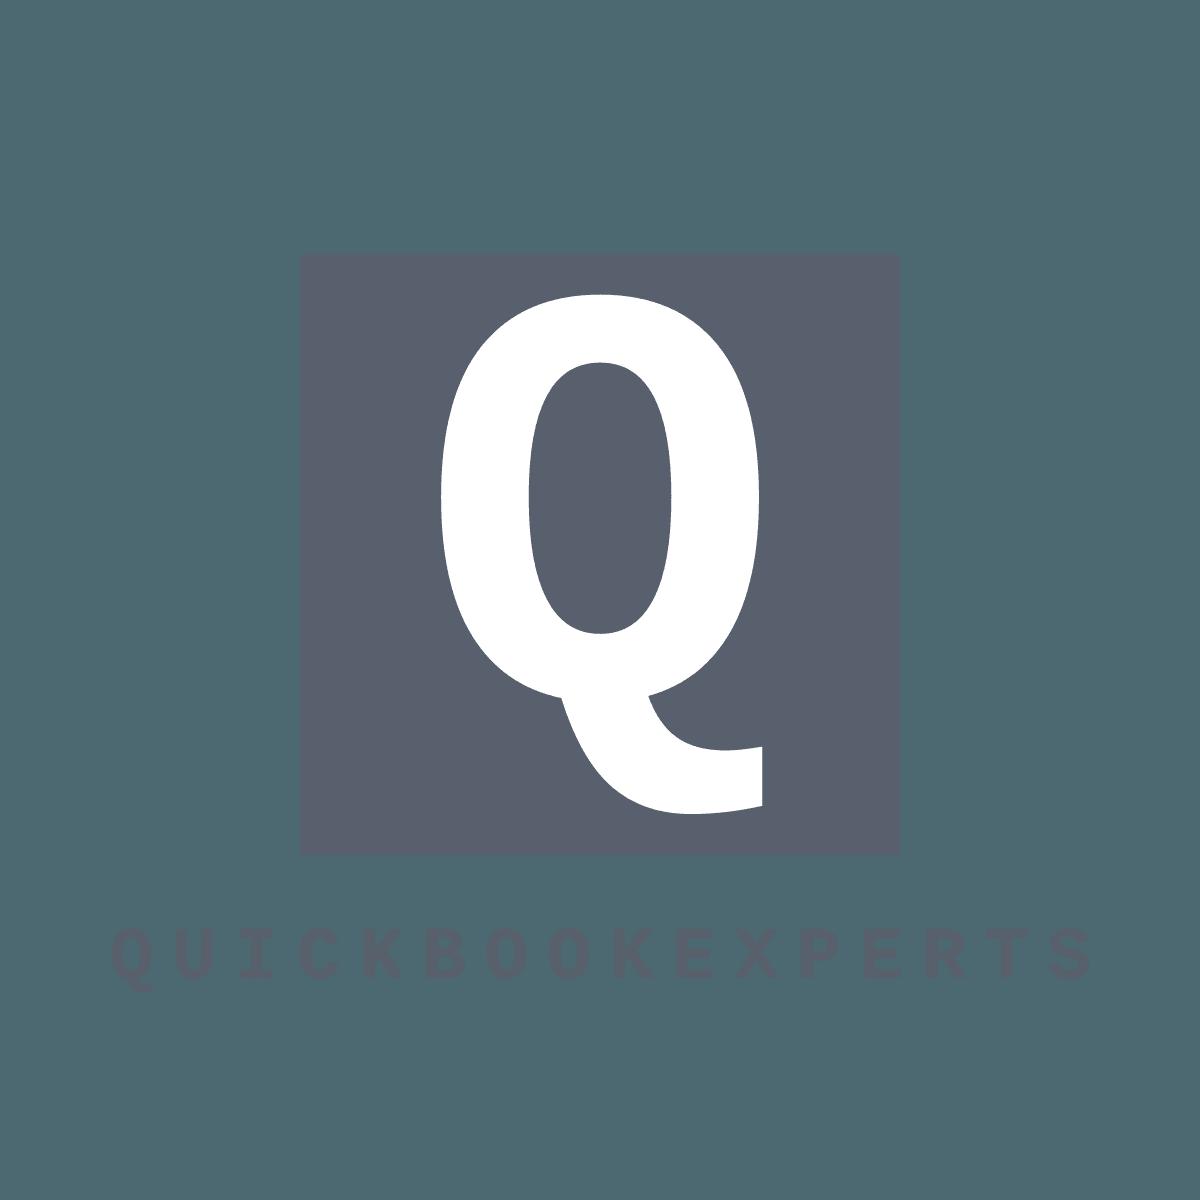 QuuickBooks Official Logo 2019